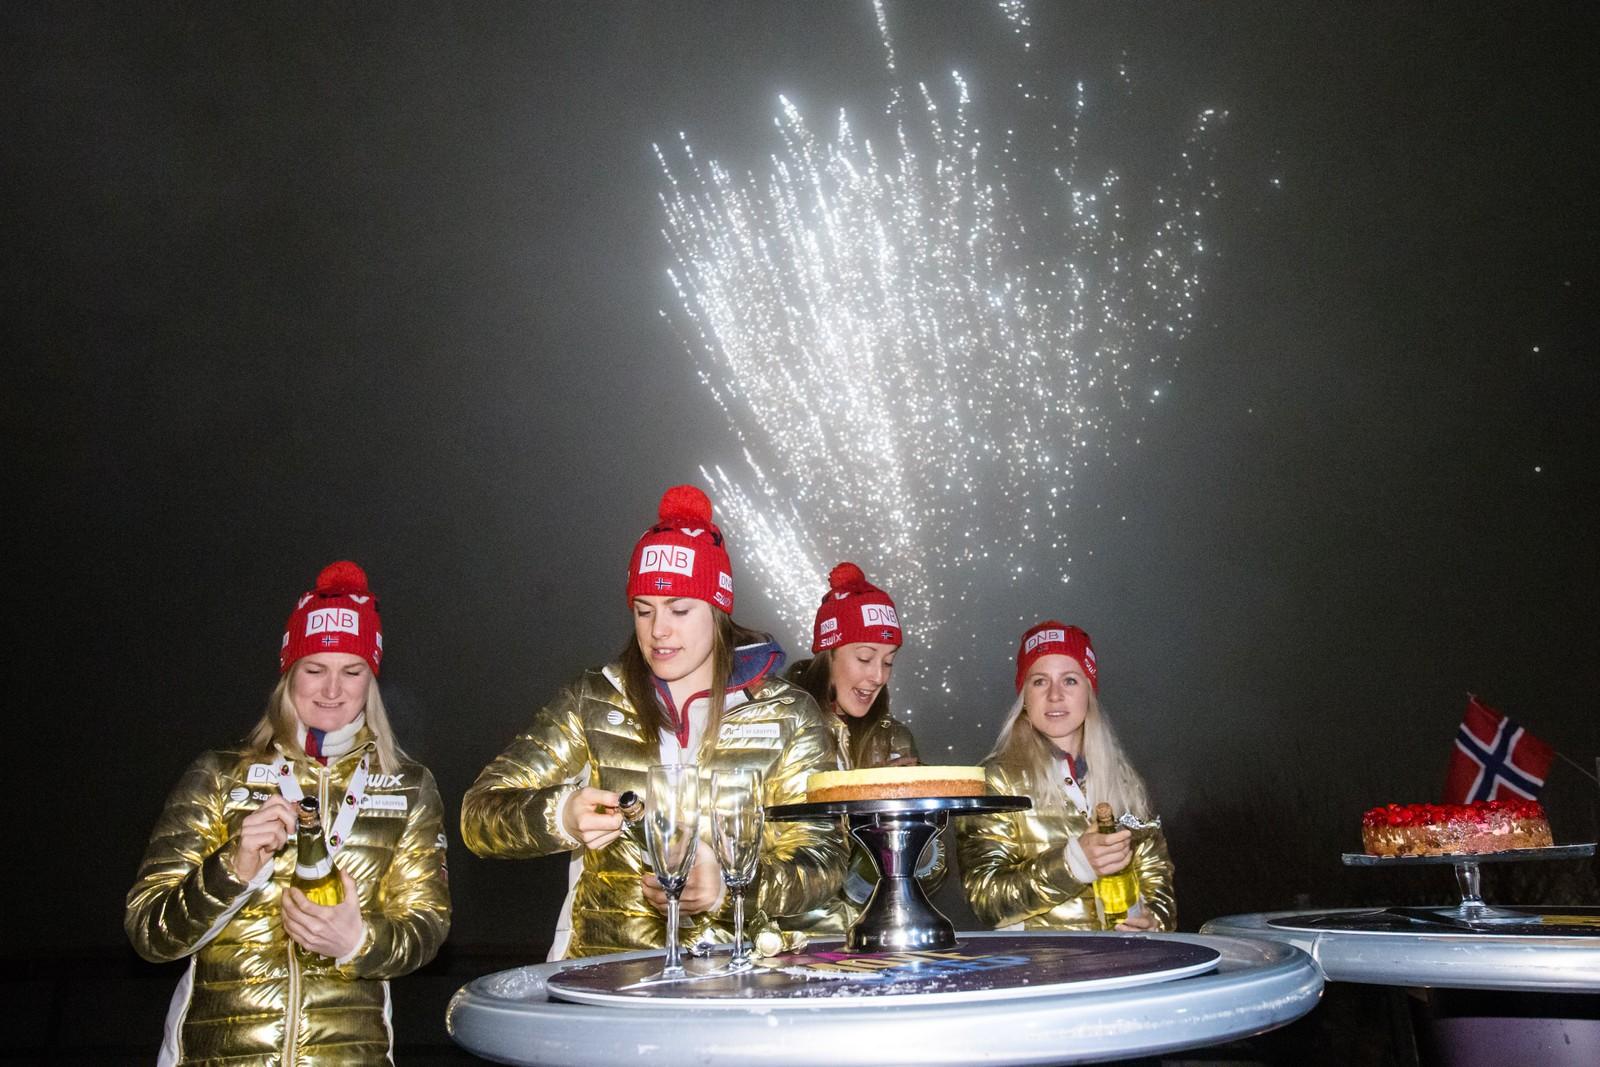 Marte Olsbu (t.v.), Synnøve Solemdal, Fanny Horn Birkeland og Tiril Eckhoff under markeringen av Norges gull på stafetten i VM i skiskyting i Holmenkollen fredag kveld.